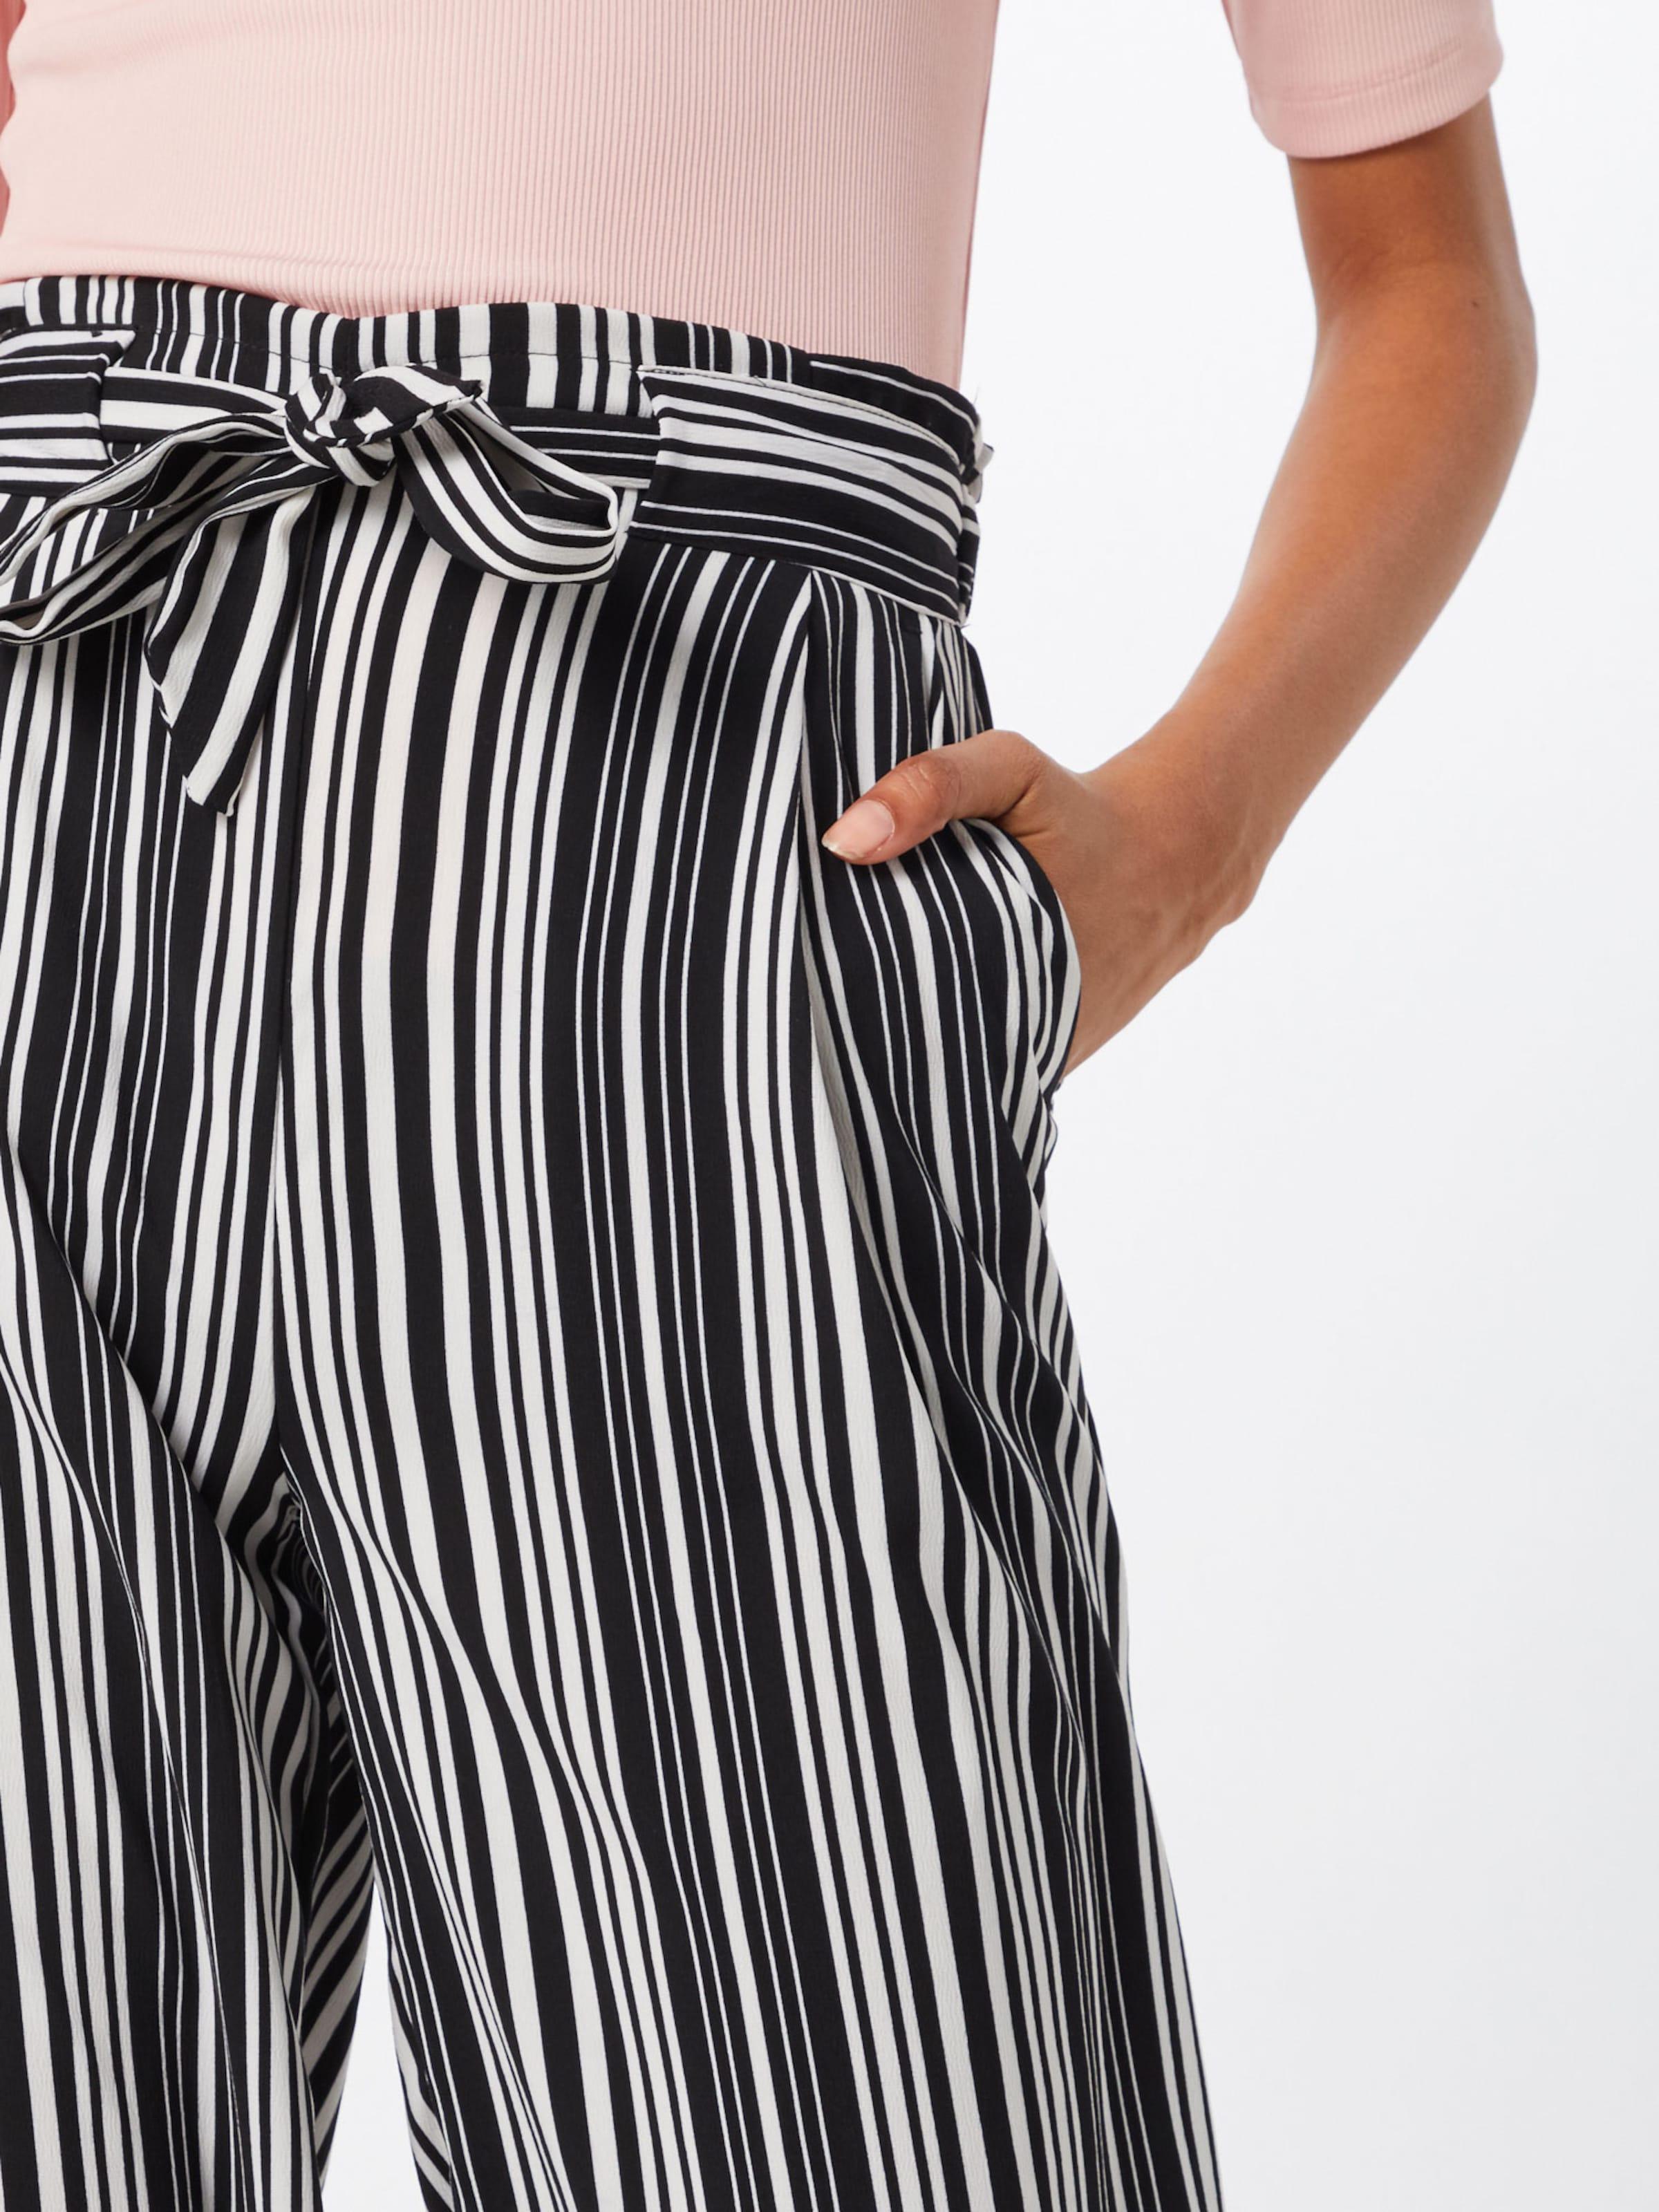 Pantalon Stripe NoirBlanc Vinnie Tie '28 En Crop' À Ww Emerald Pince New Look Waist 09 uFTl1Jc3K